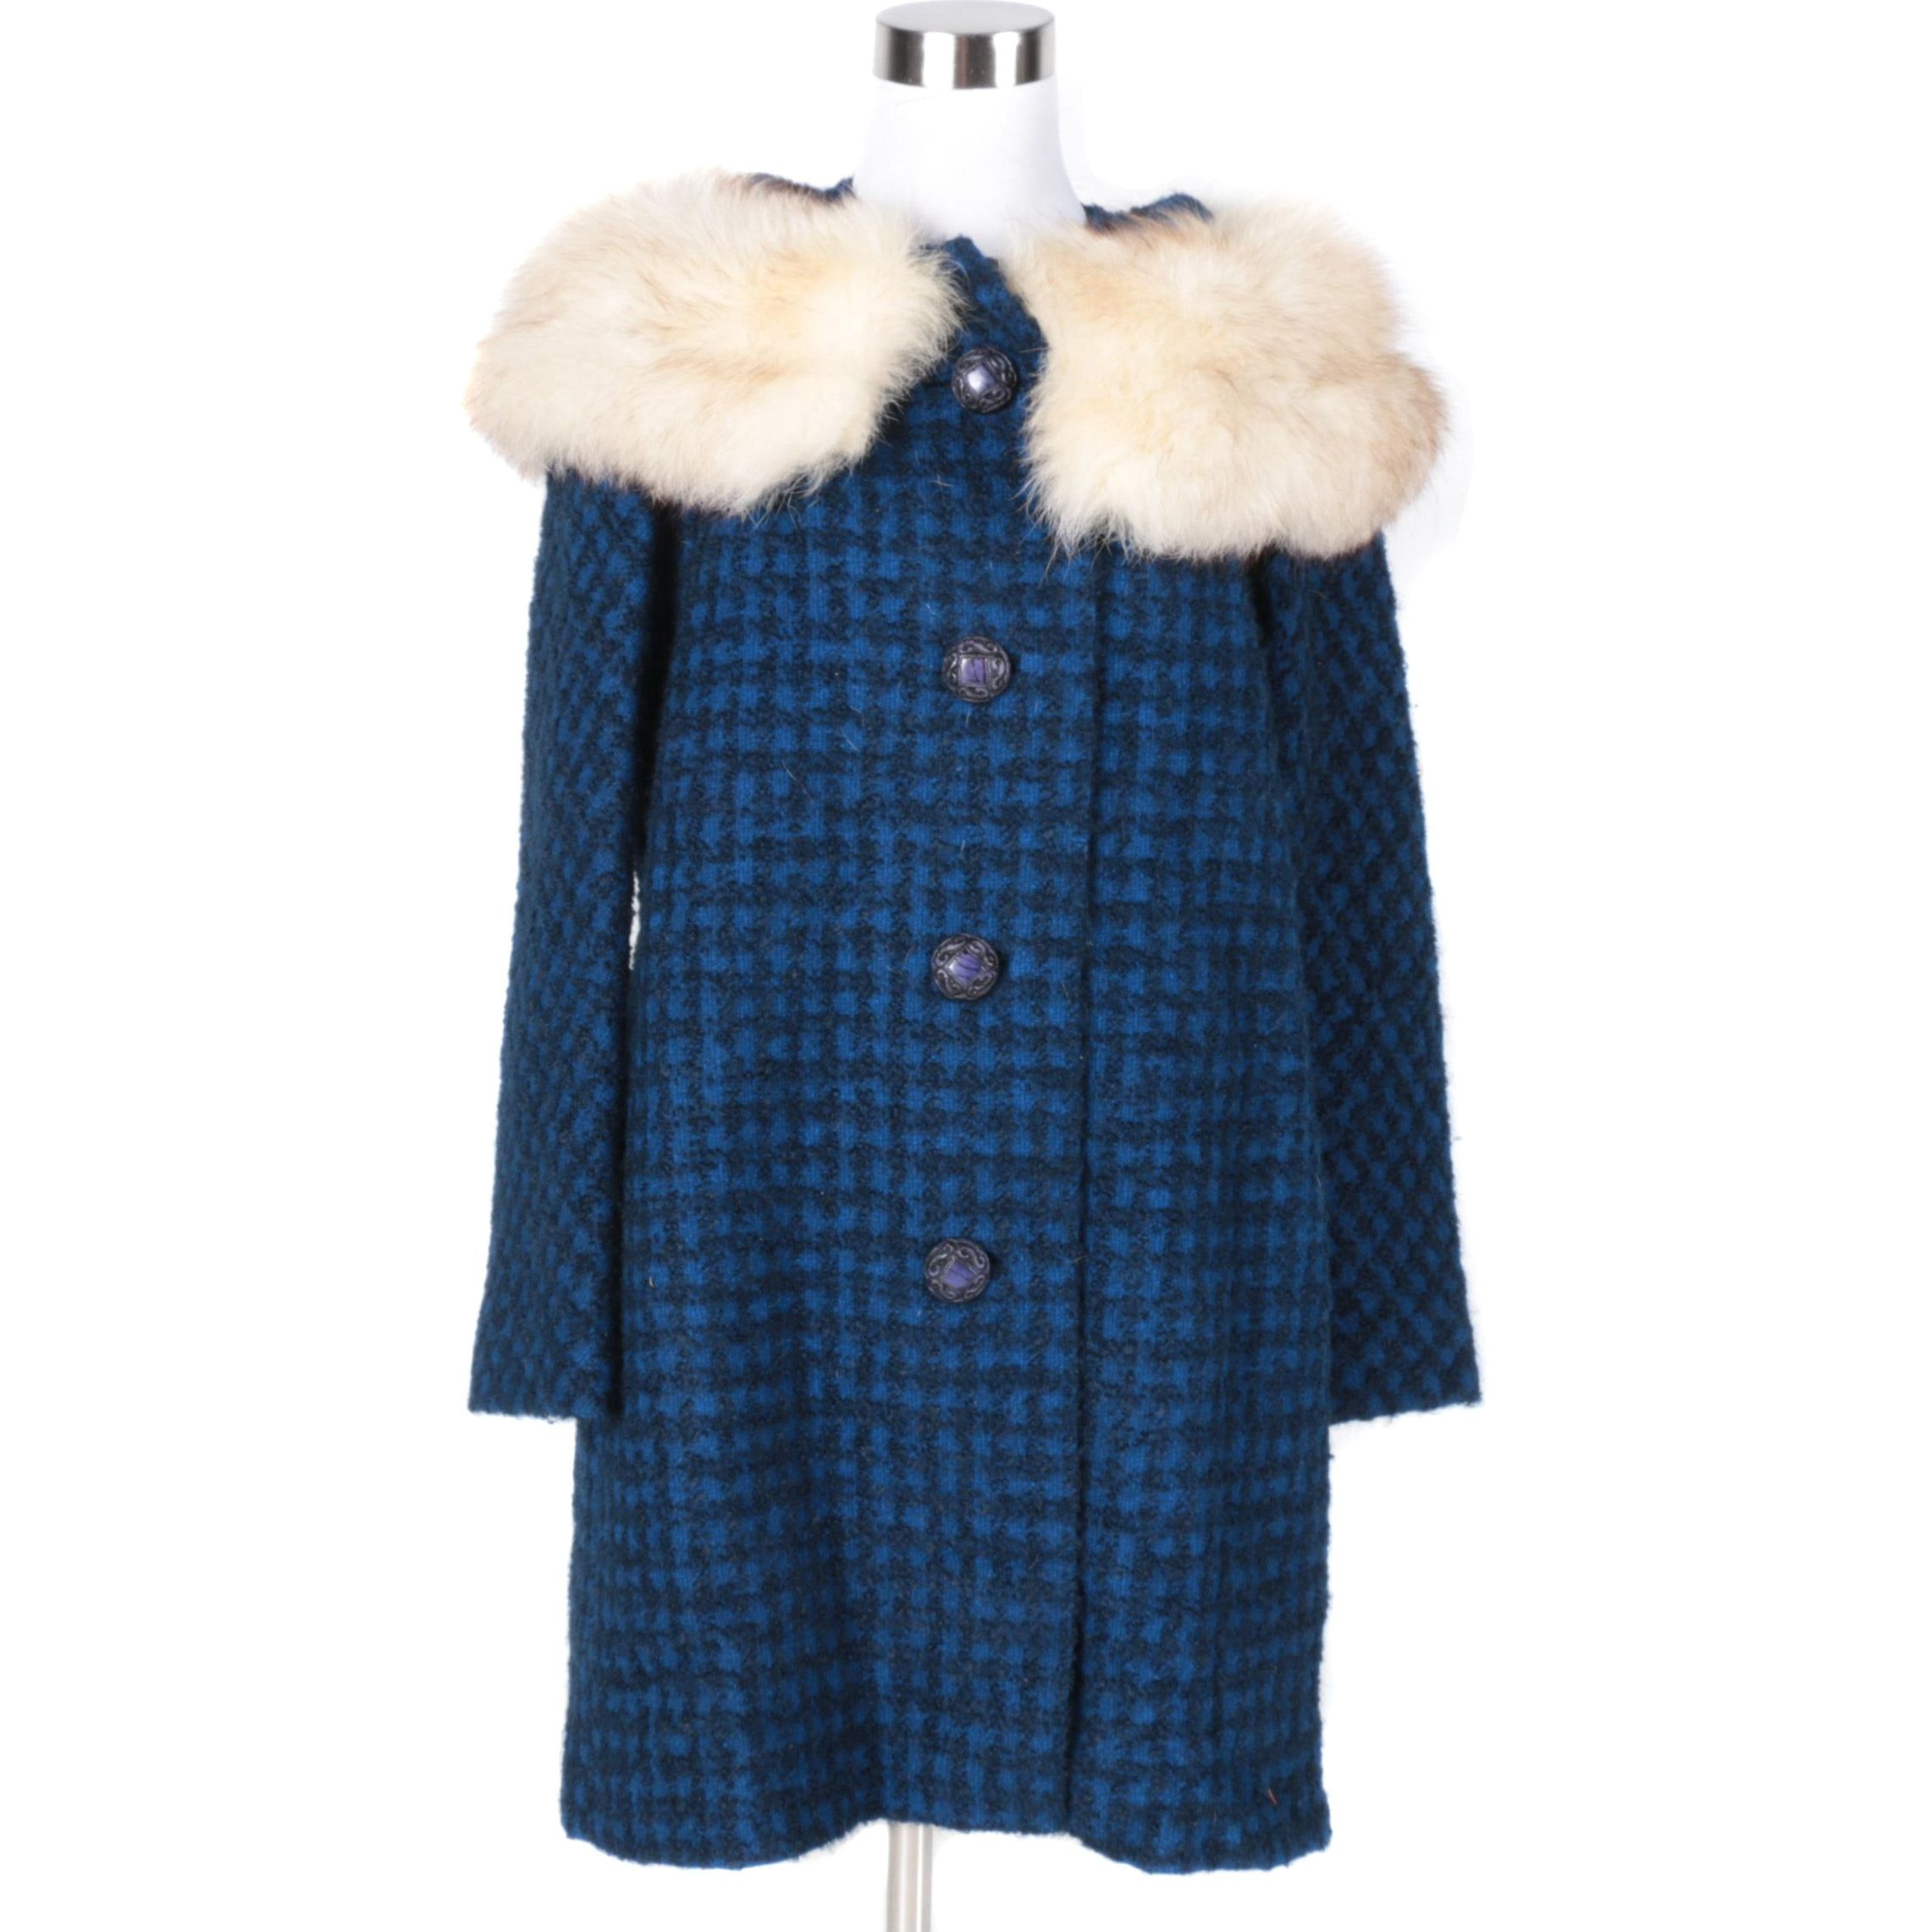 Dress Coat with Fox Fur Trim